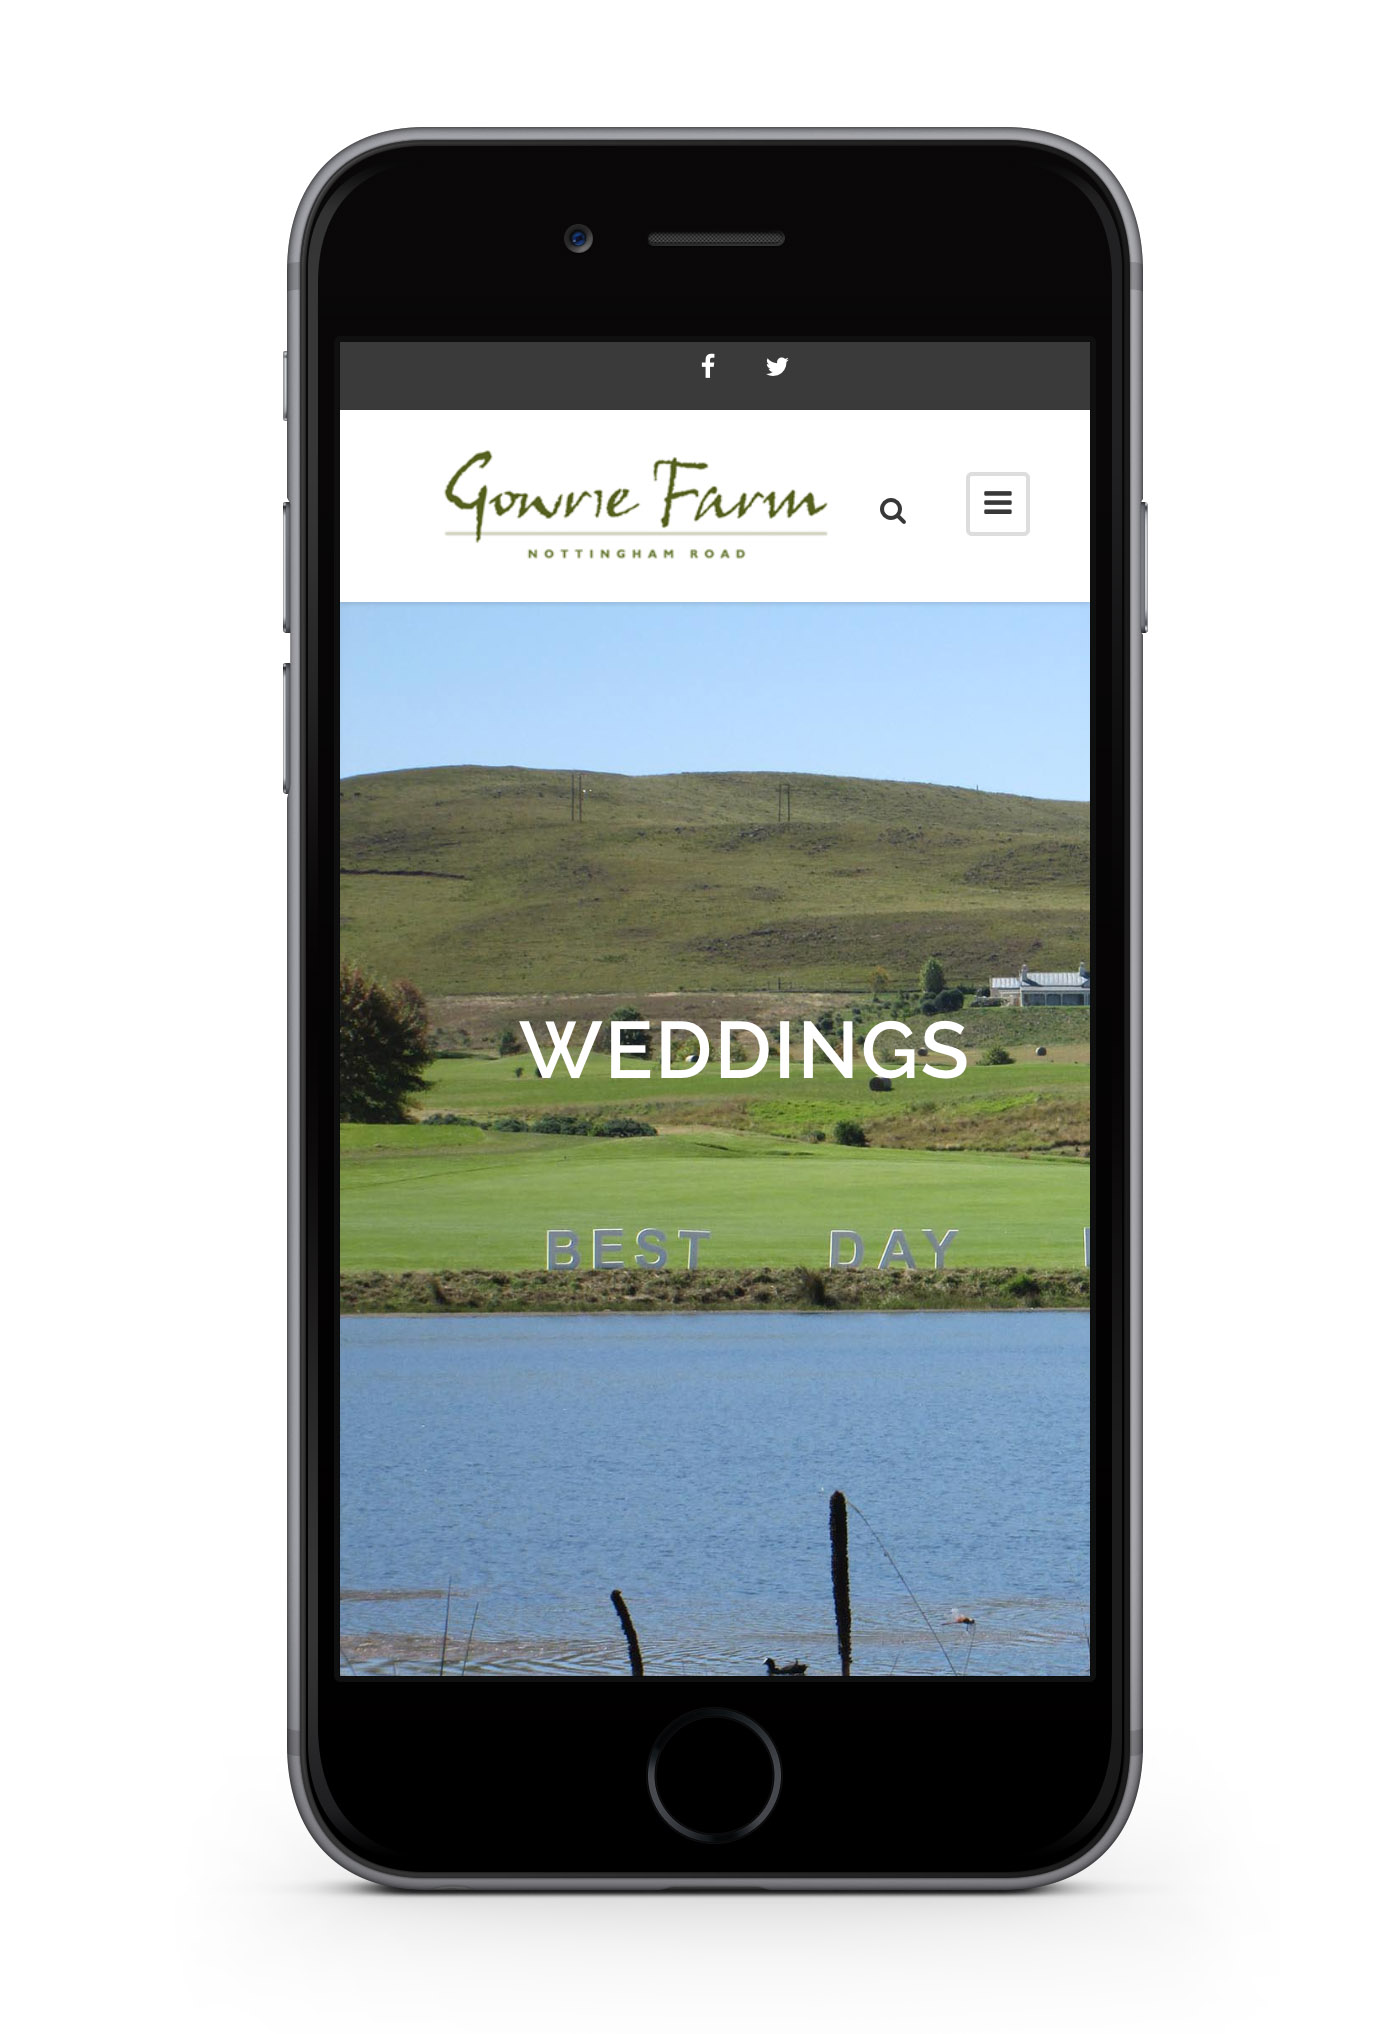 gowrie farm web-design-portfolio-webdoor-responsive-web-design-agency-hillcrest-kwazulu-natal-phone